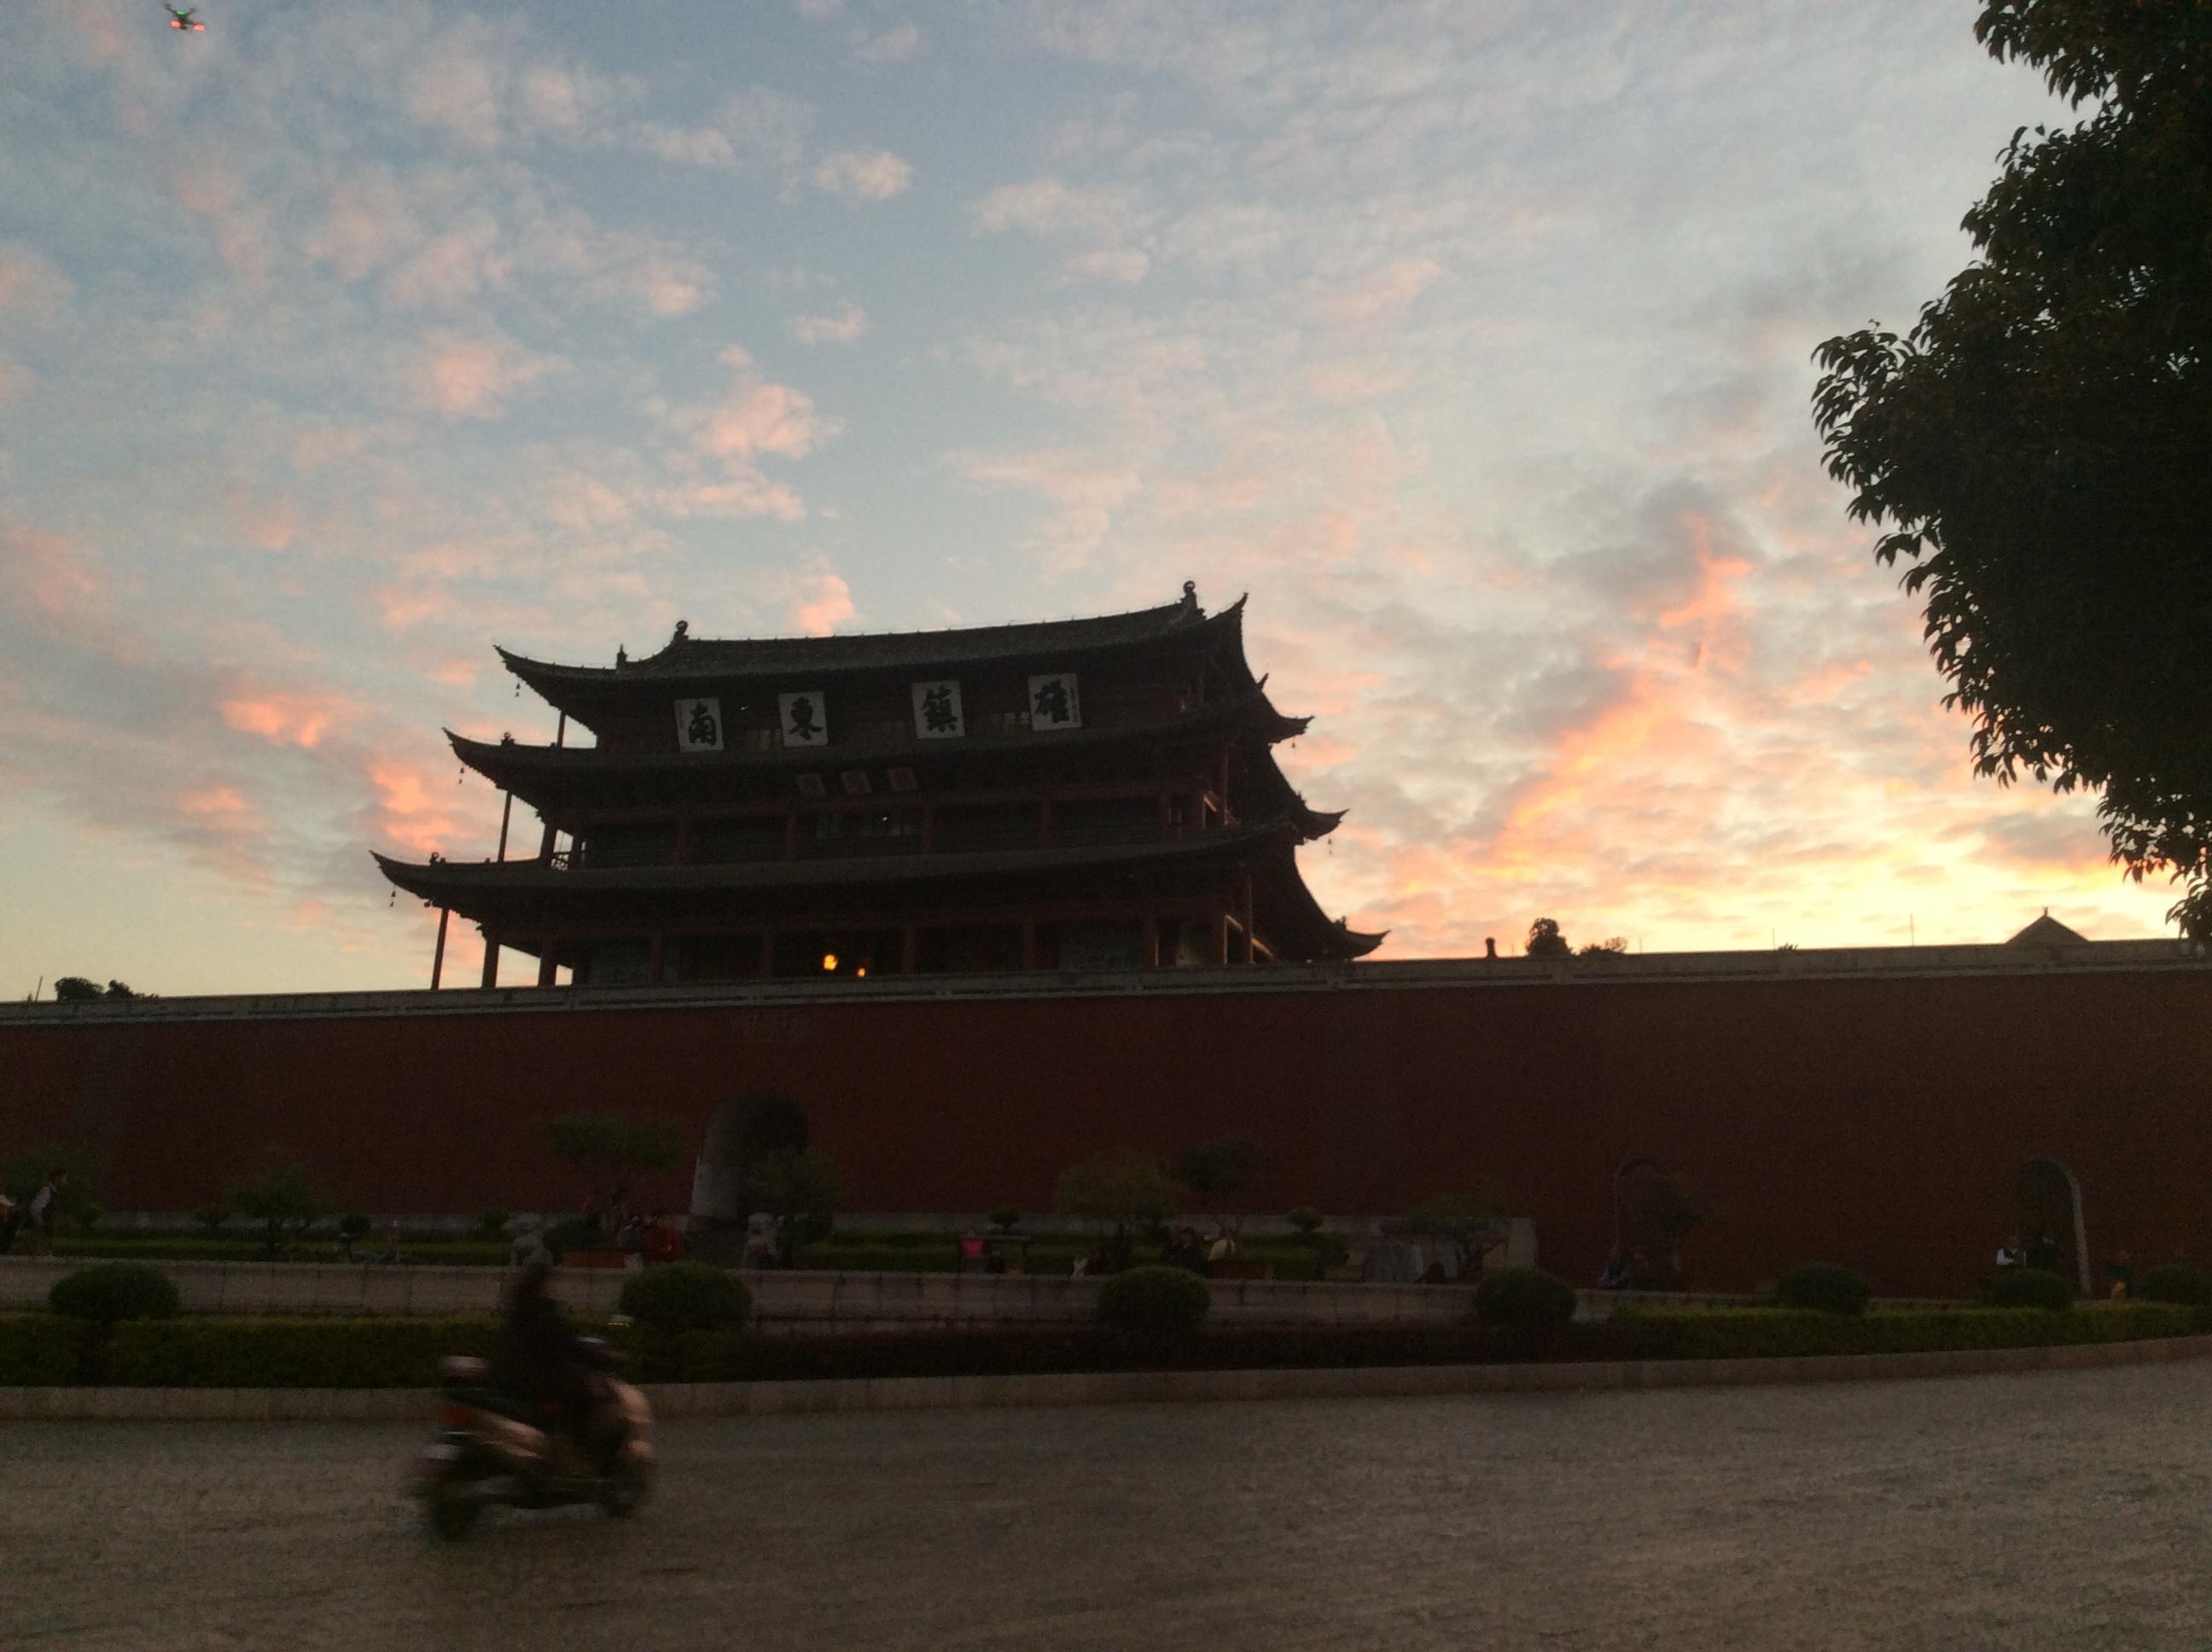 Wei Shan the home of Dao – Taoism